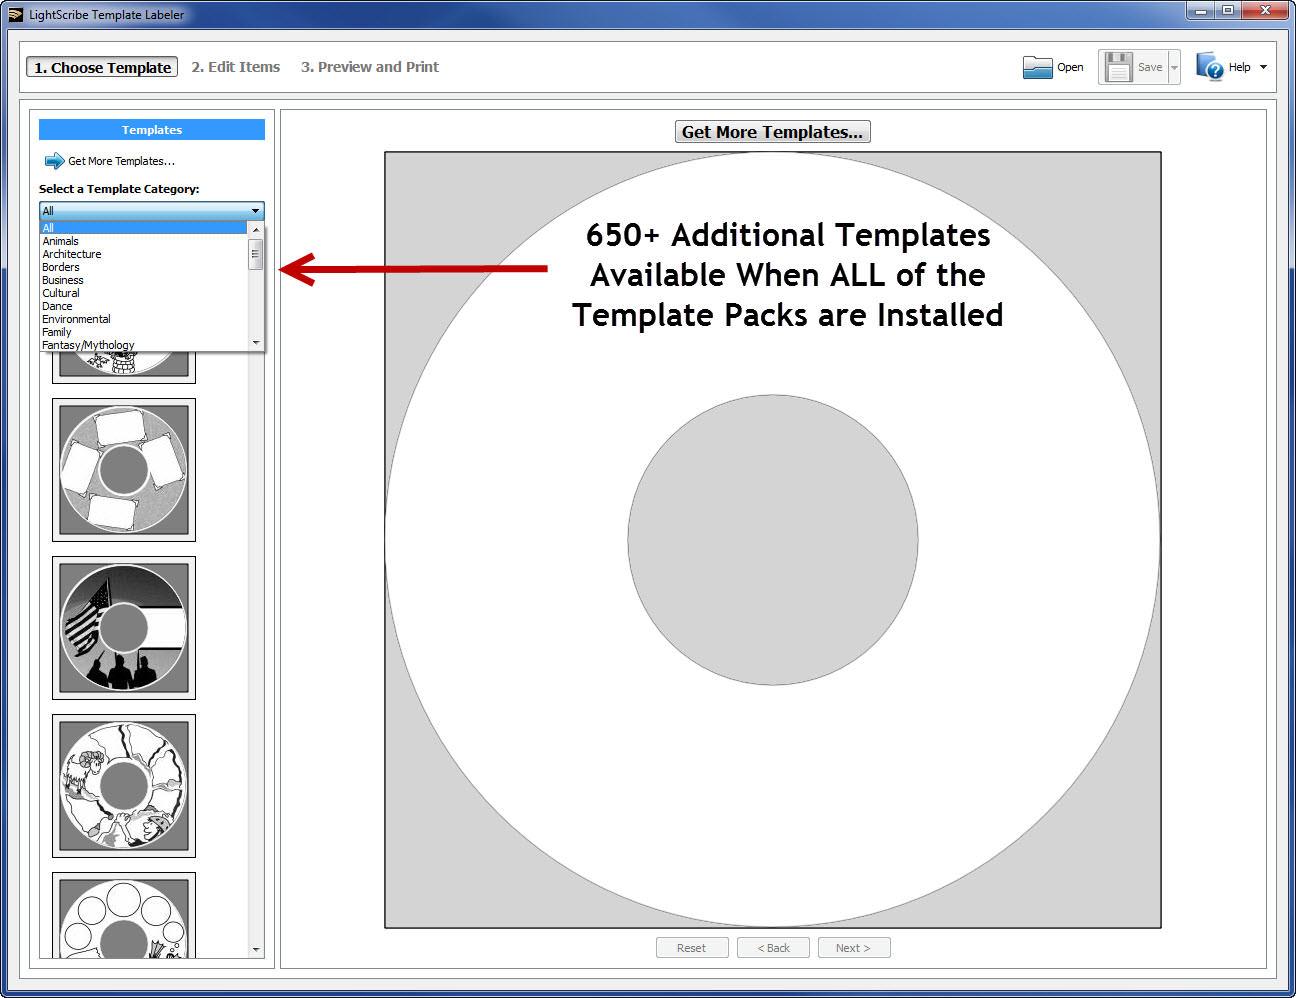 LightScribe Template Labeler Installed